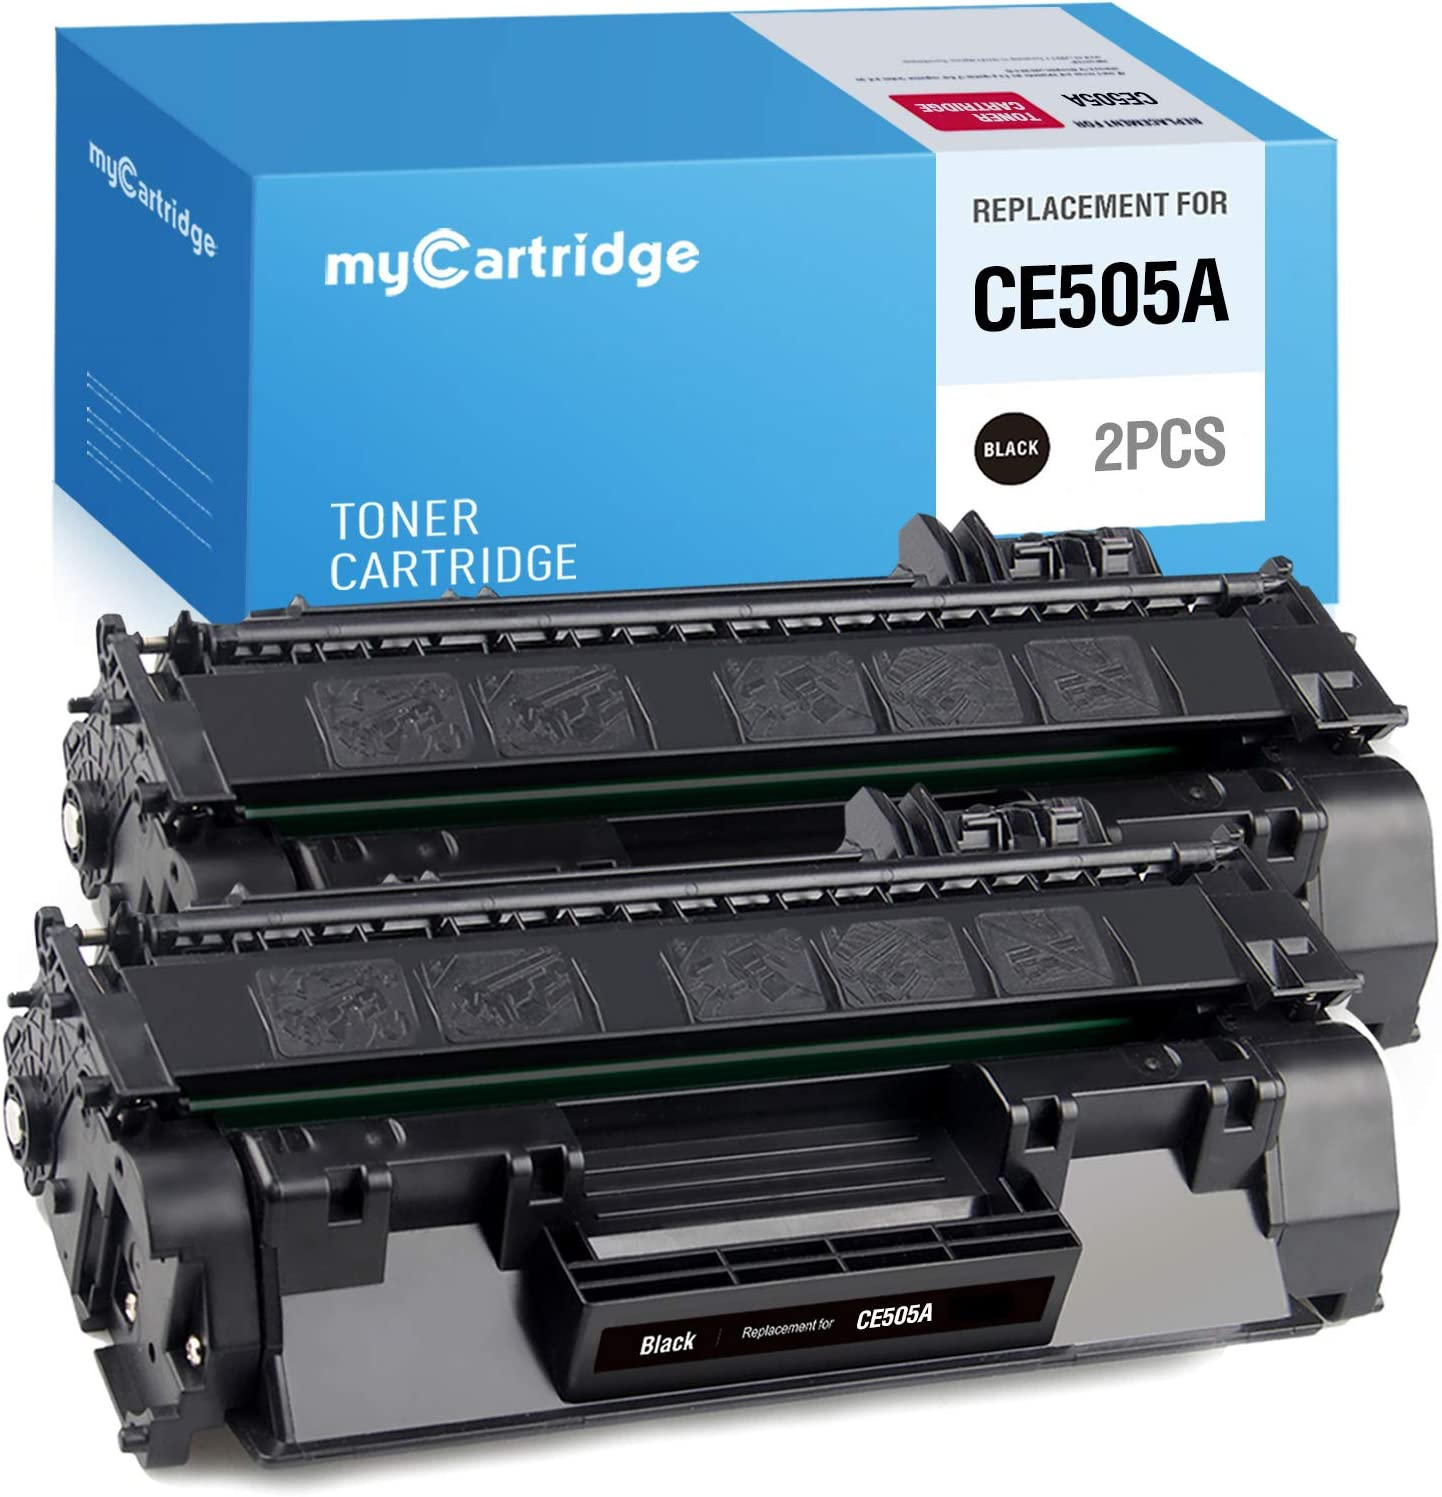 MYCARTRIDGE Compatible Toner Cartridge Replacement for HP 05A CE505A for Laserjet P2035 P2035n P2055dn P2055d P2055x Pro m401n m401dne m401dw M401a M401d M401dn MFP M425dn M425dw M425 (Black, 2-Pack)